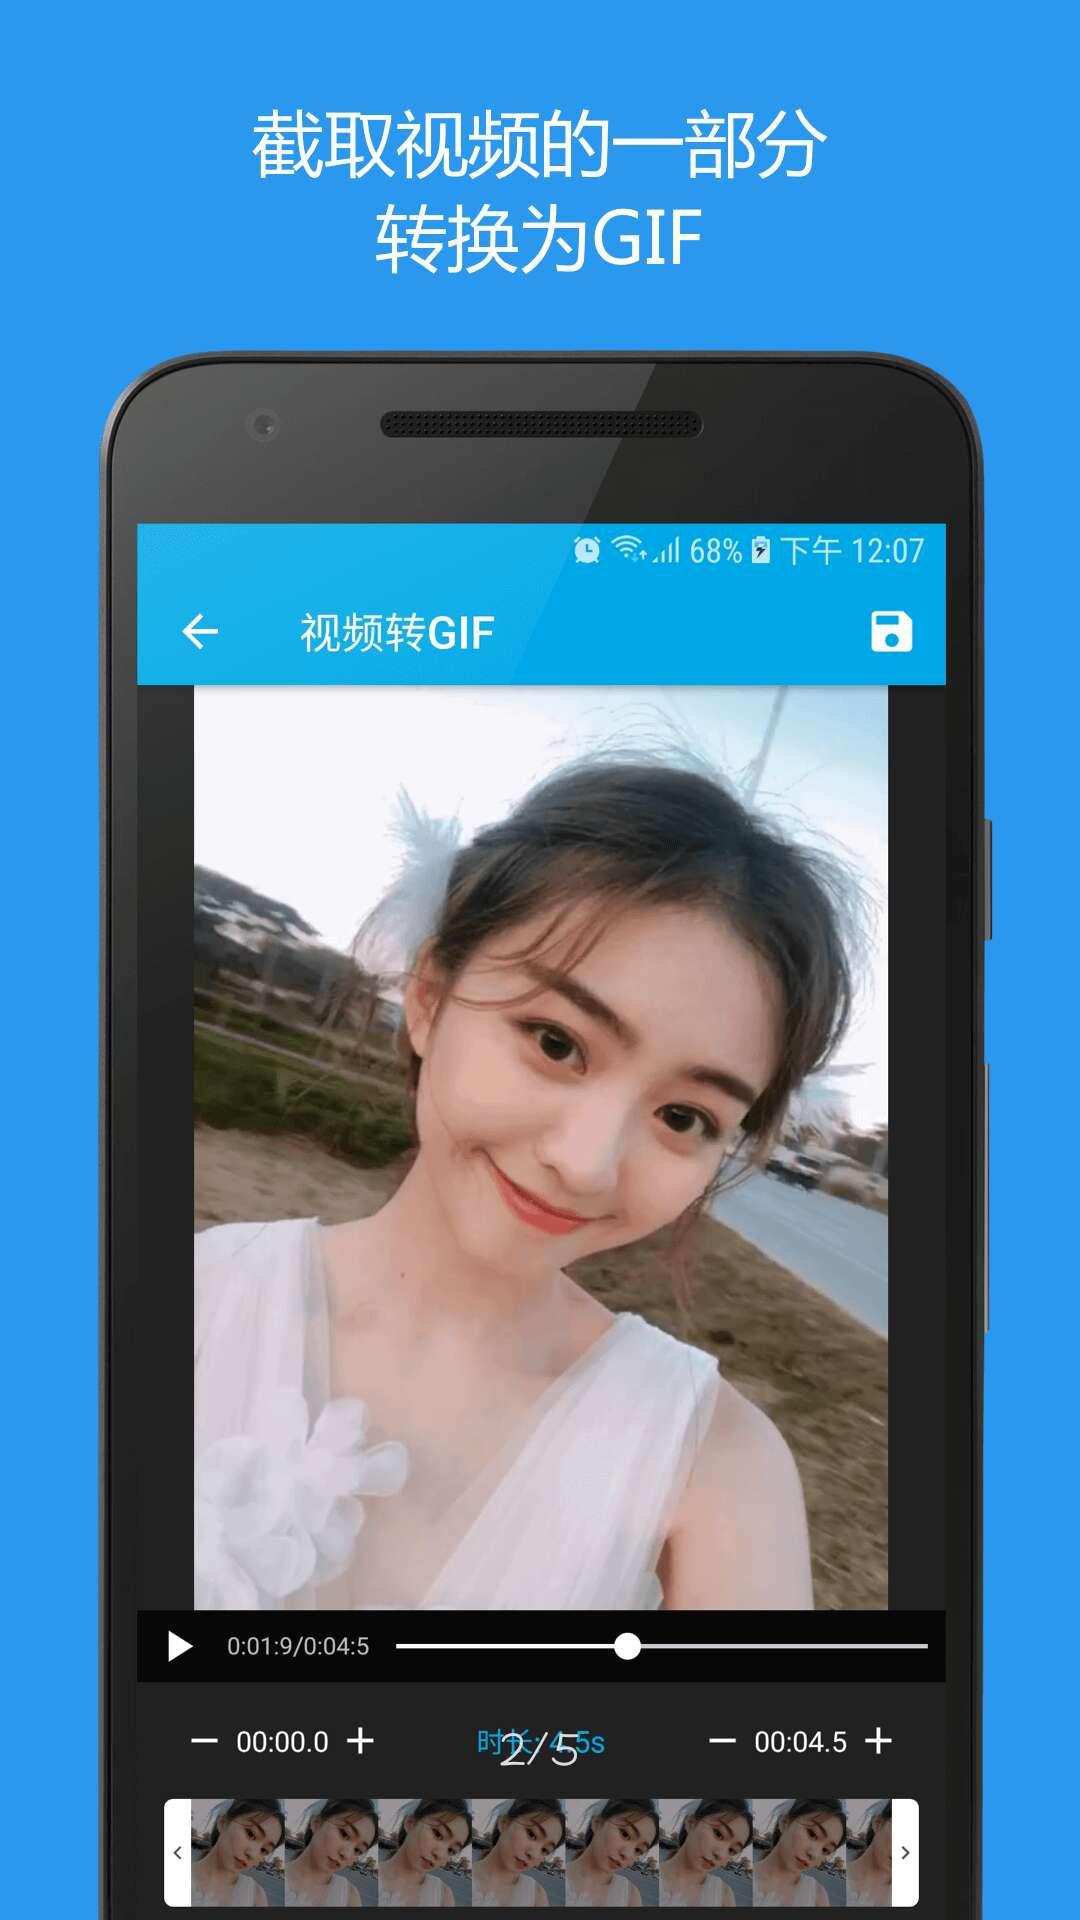 【分享】Gif助手 3.0.1